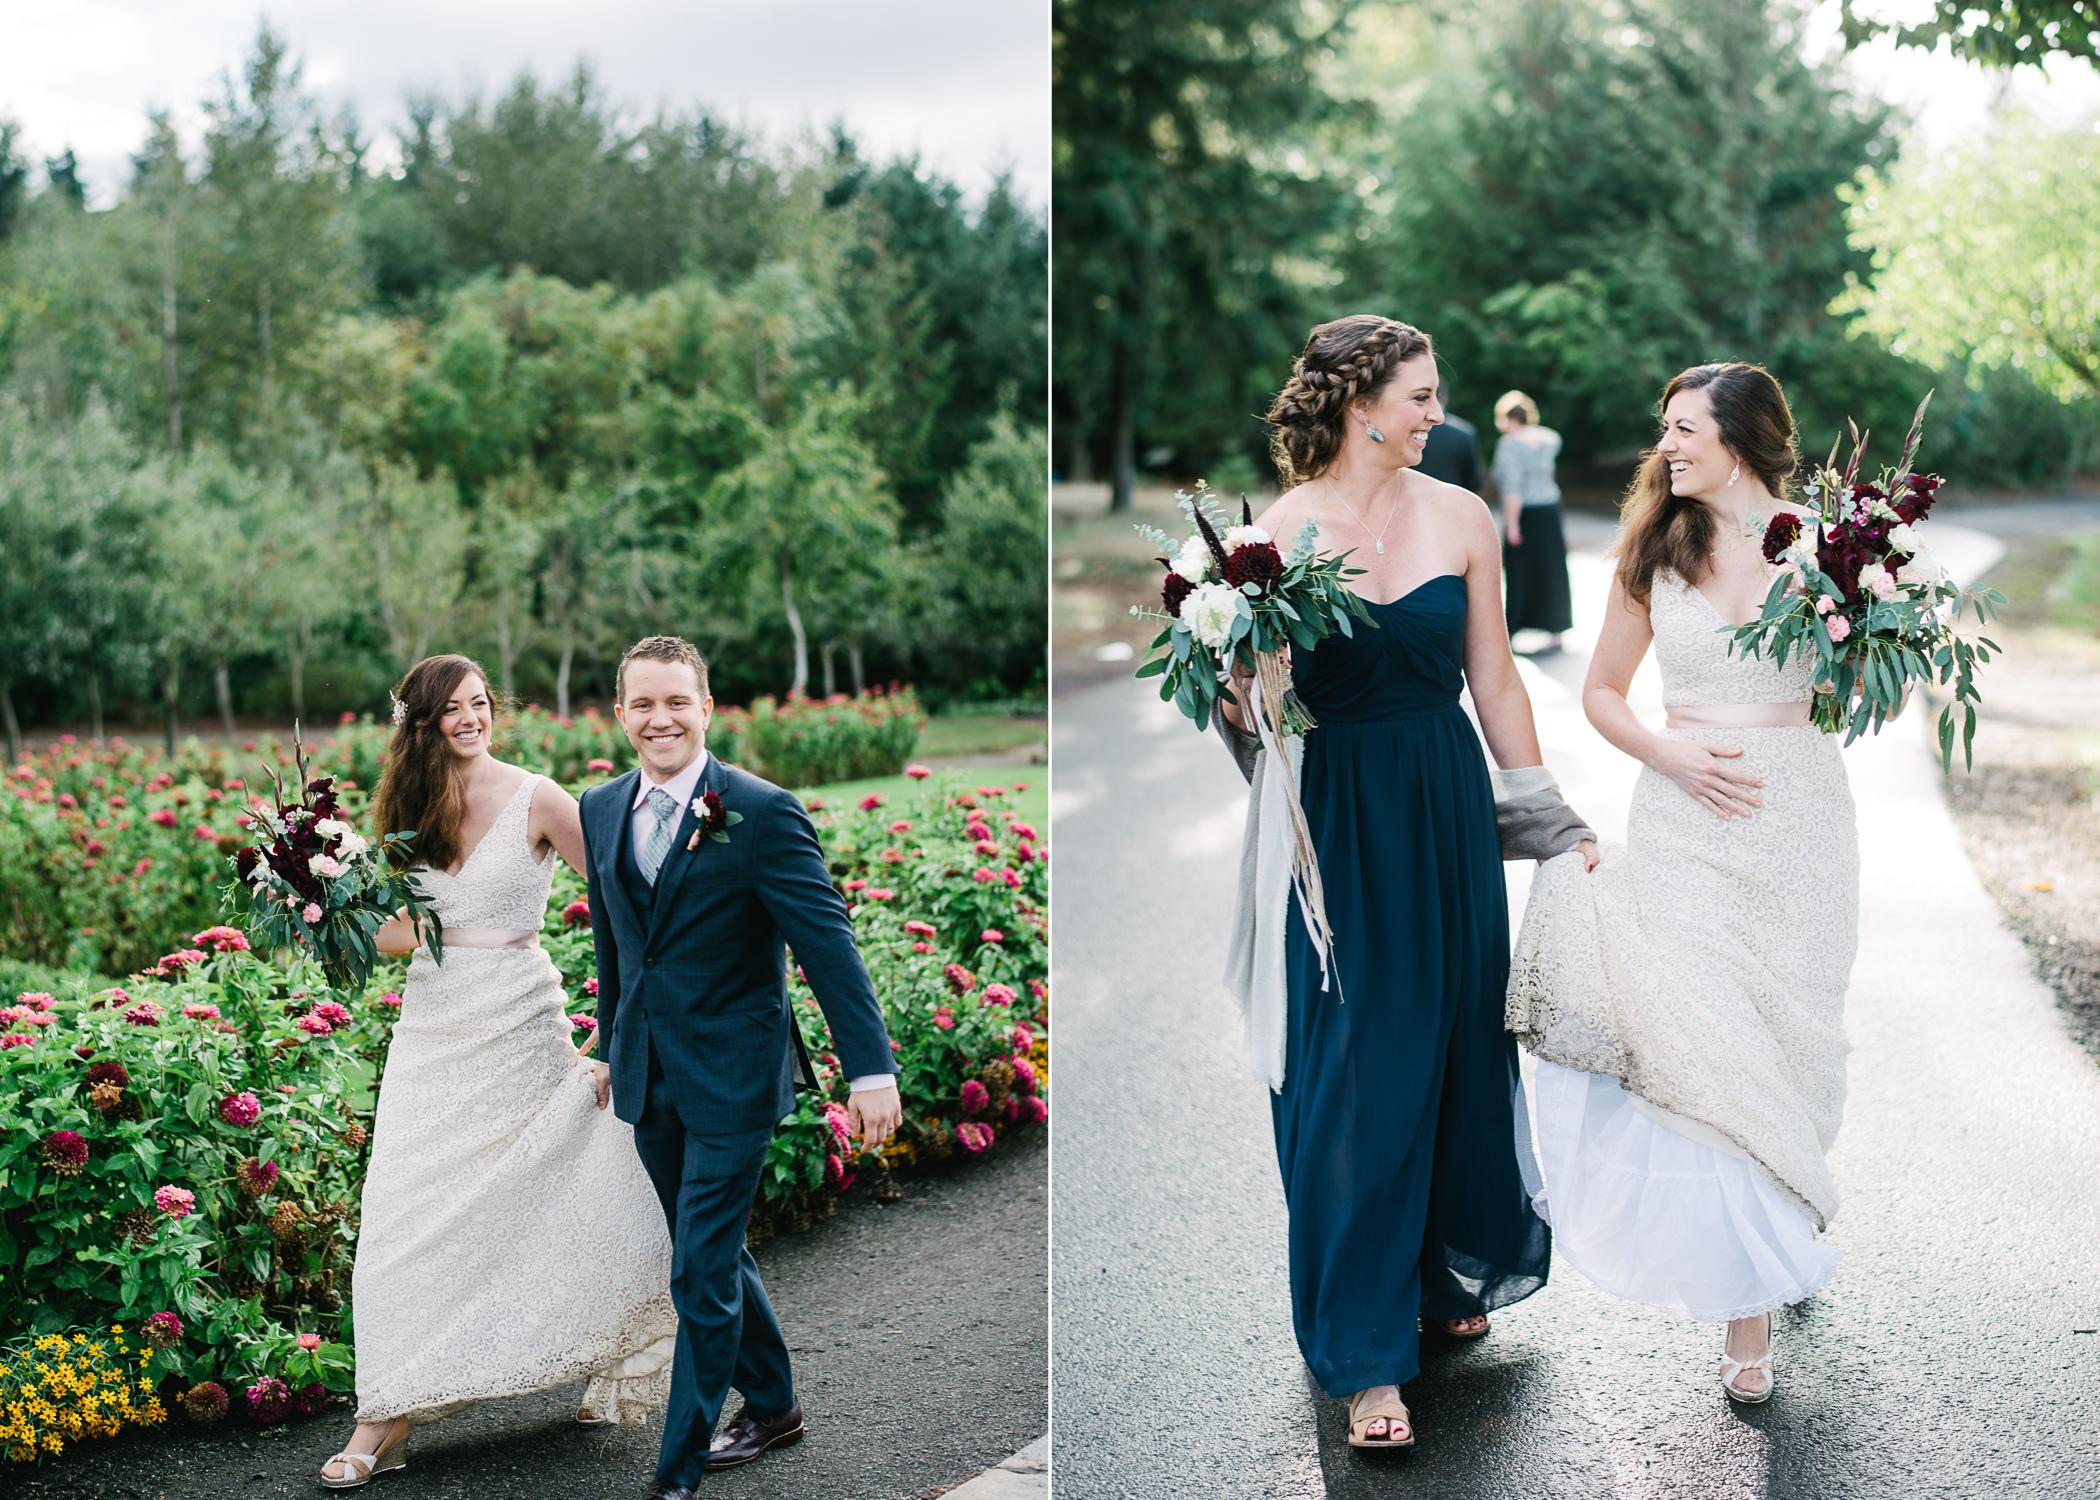 oregon-garden-resort-wedding-066a.jpg